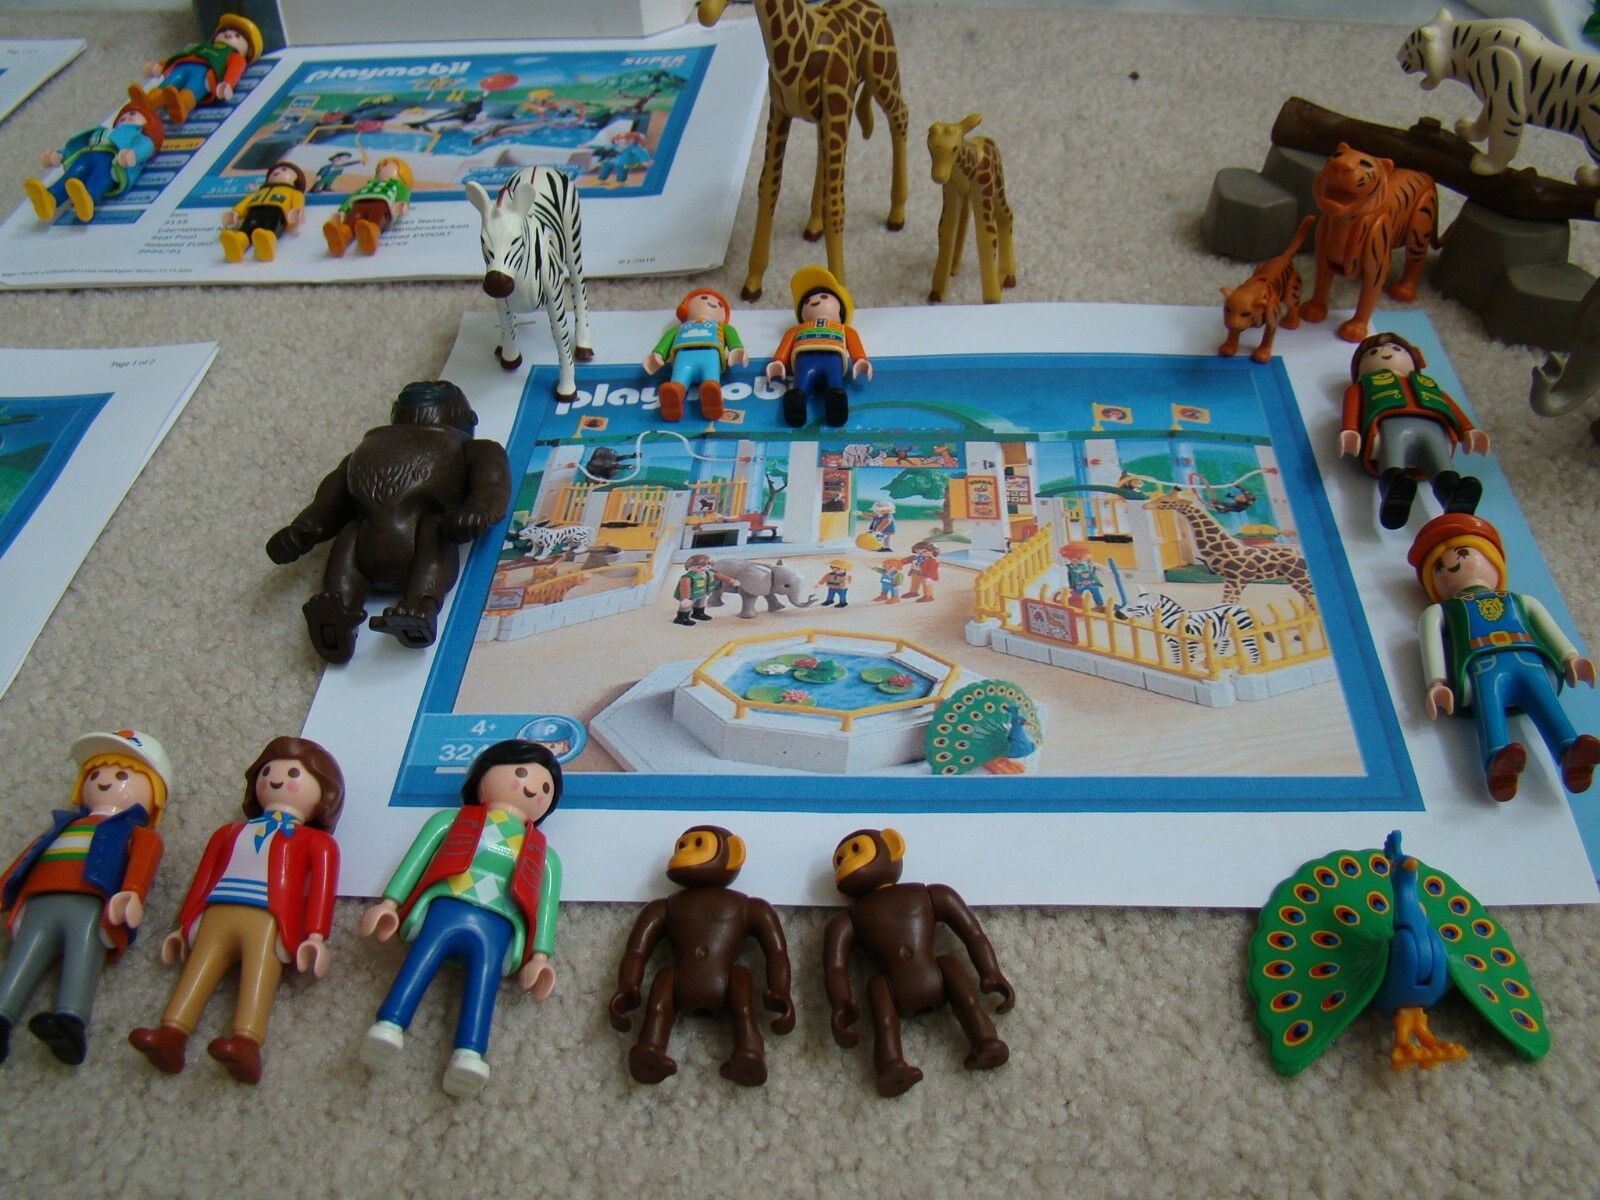 Playmobile Zoo Set  3240 Plus Sets  3238,  3135,  3241 and  3239